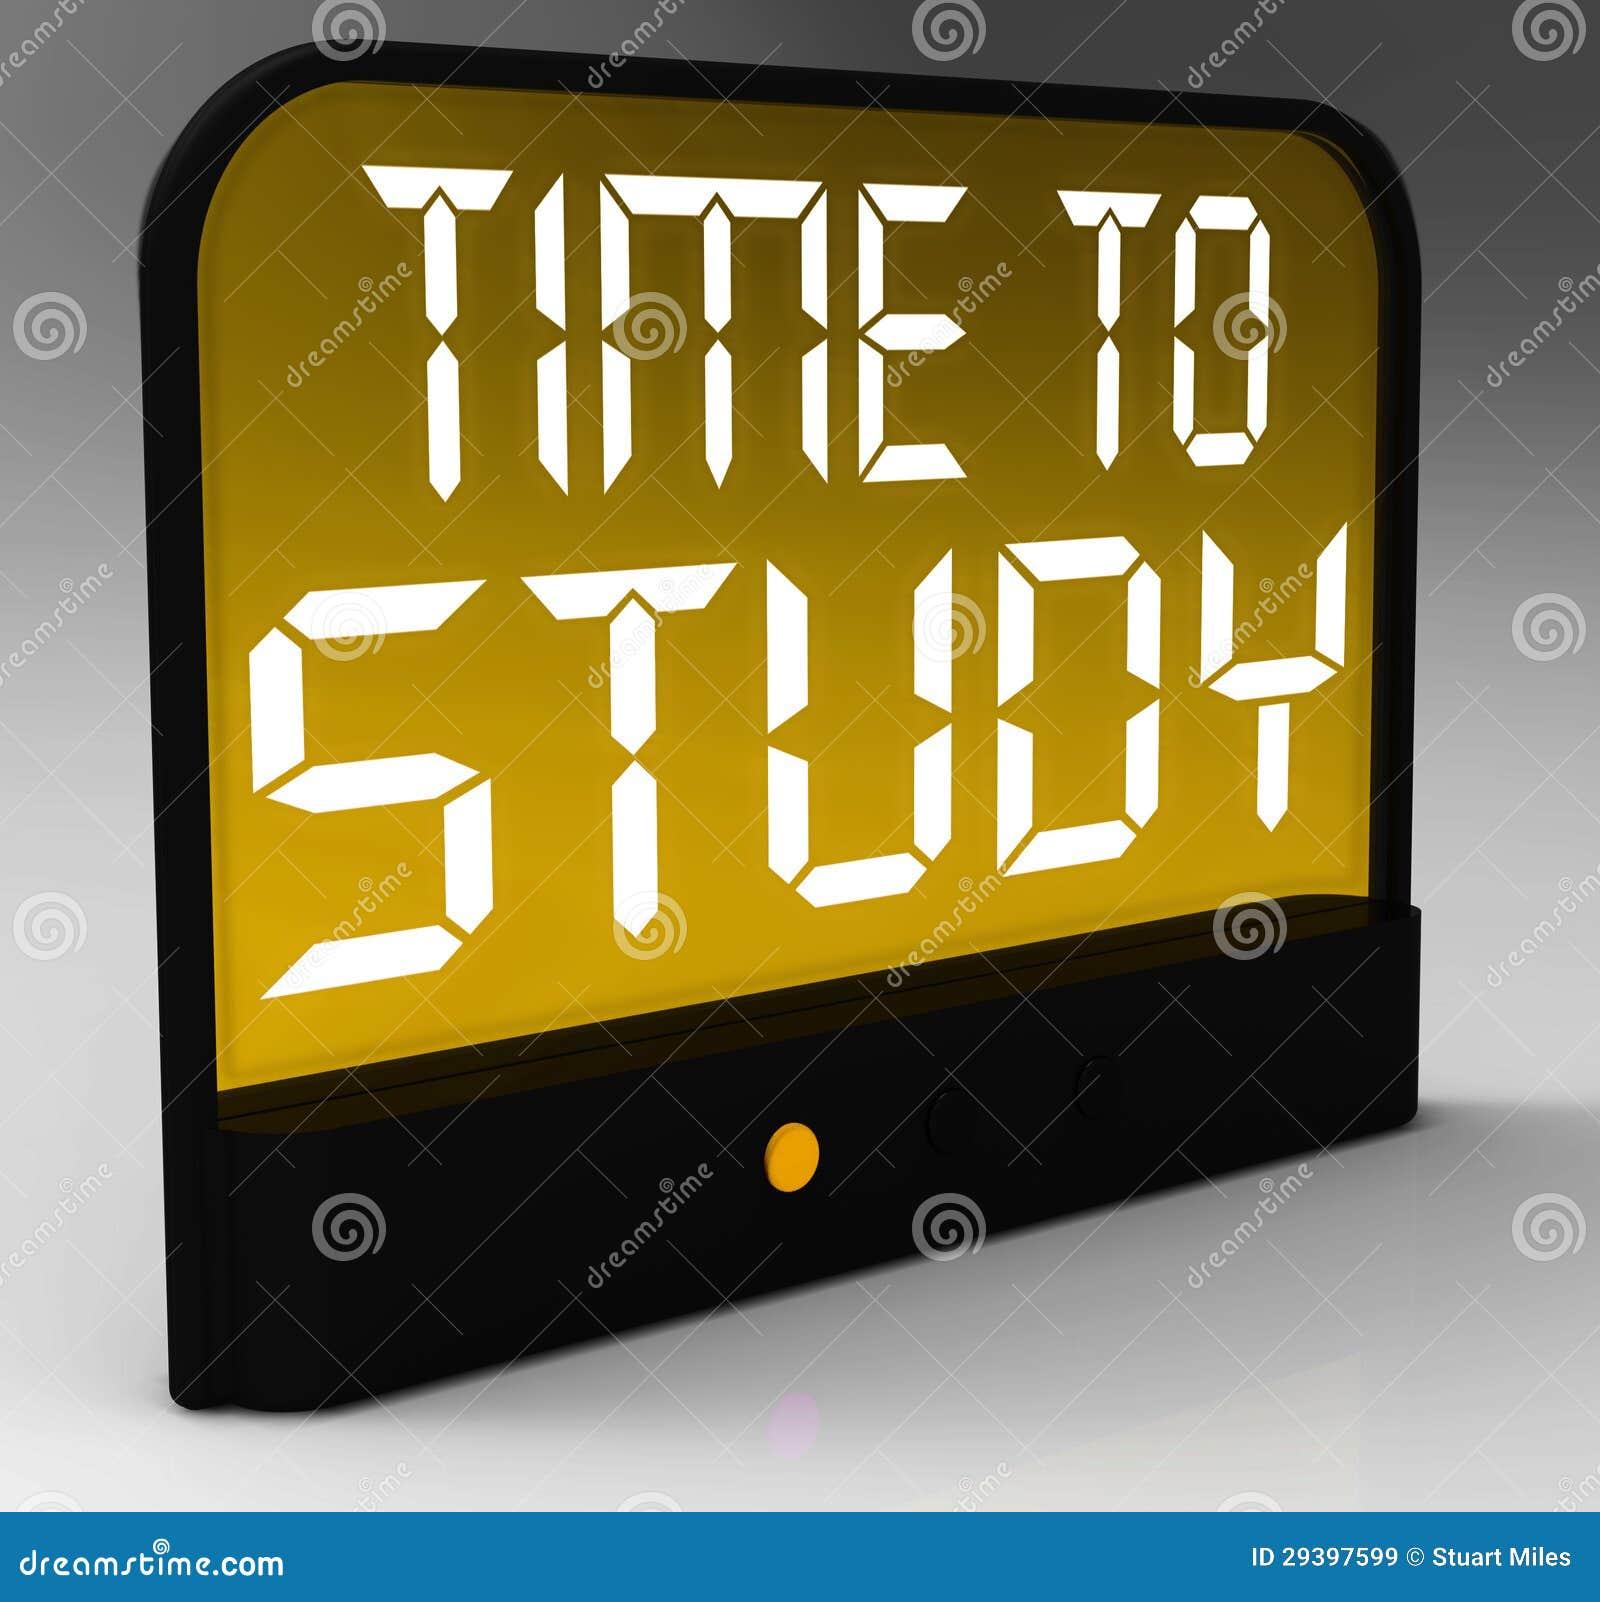 Resultado de imagen para studying time